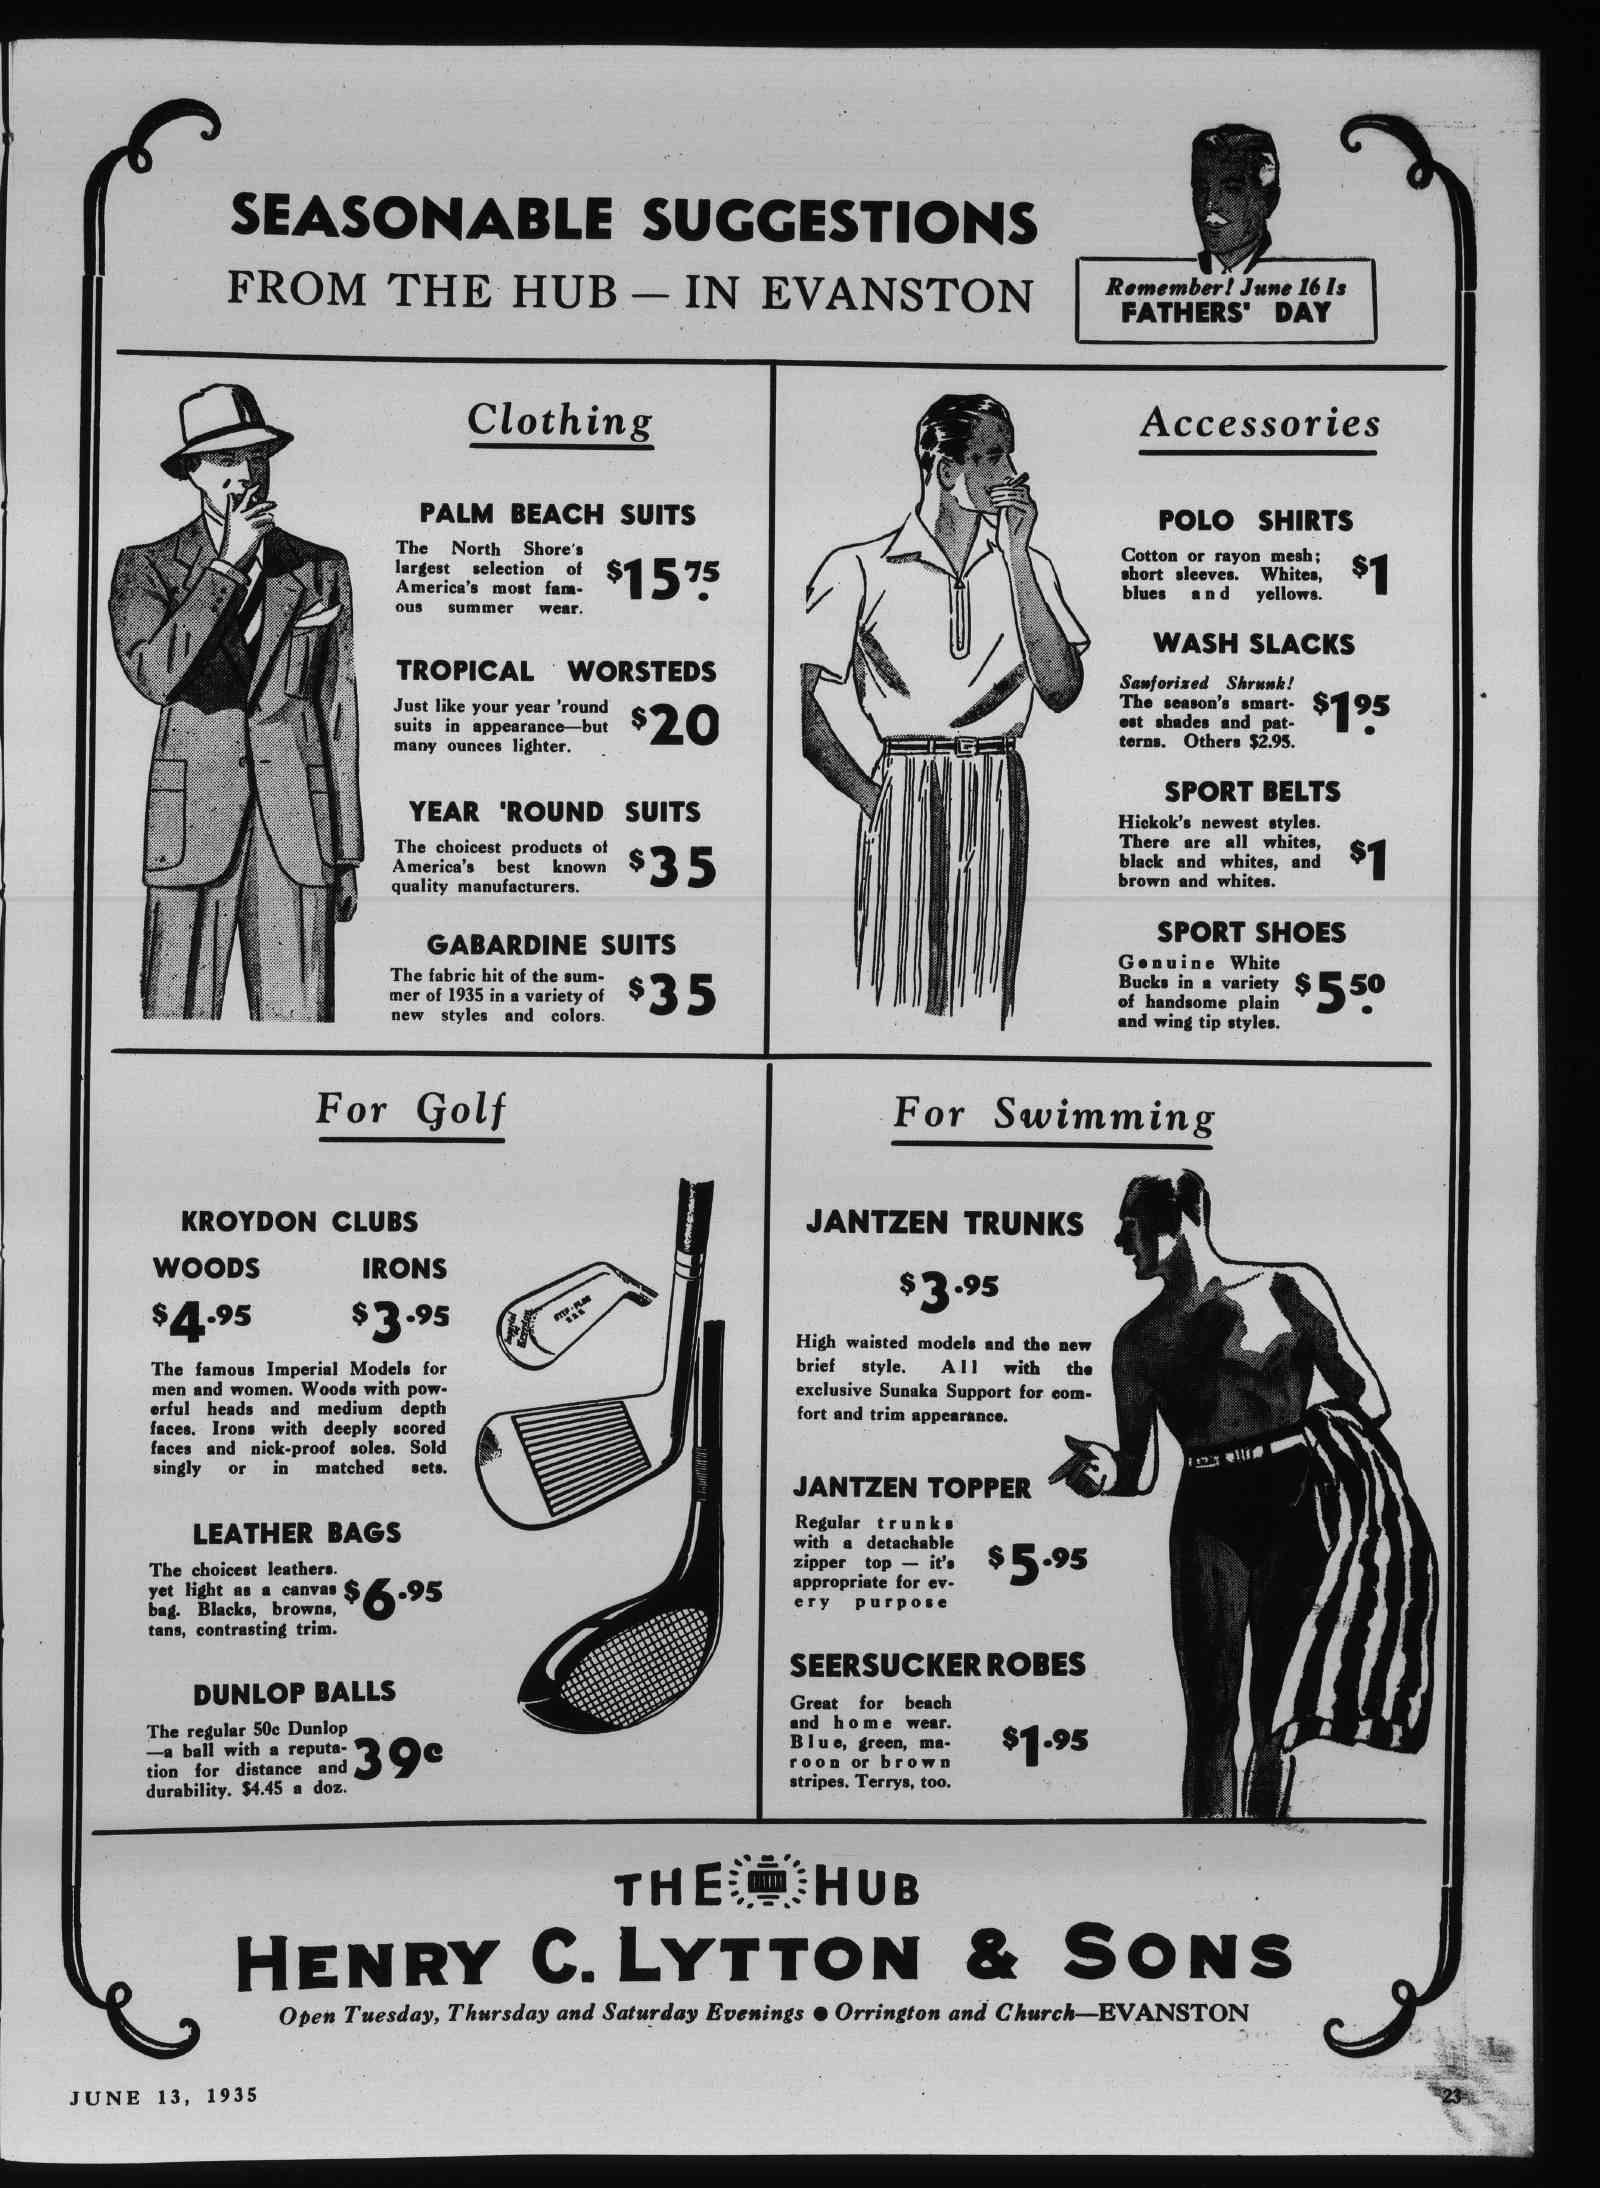 Wilmette Life (Wilmette, Illinois), 13 Jun 1935